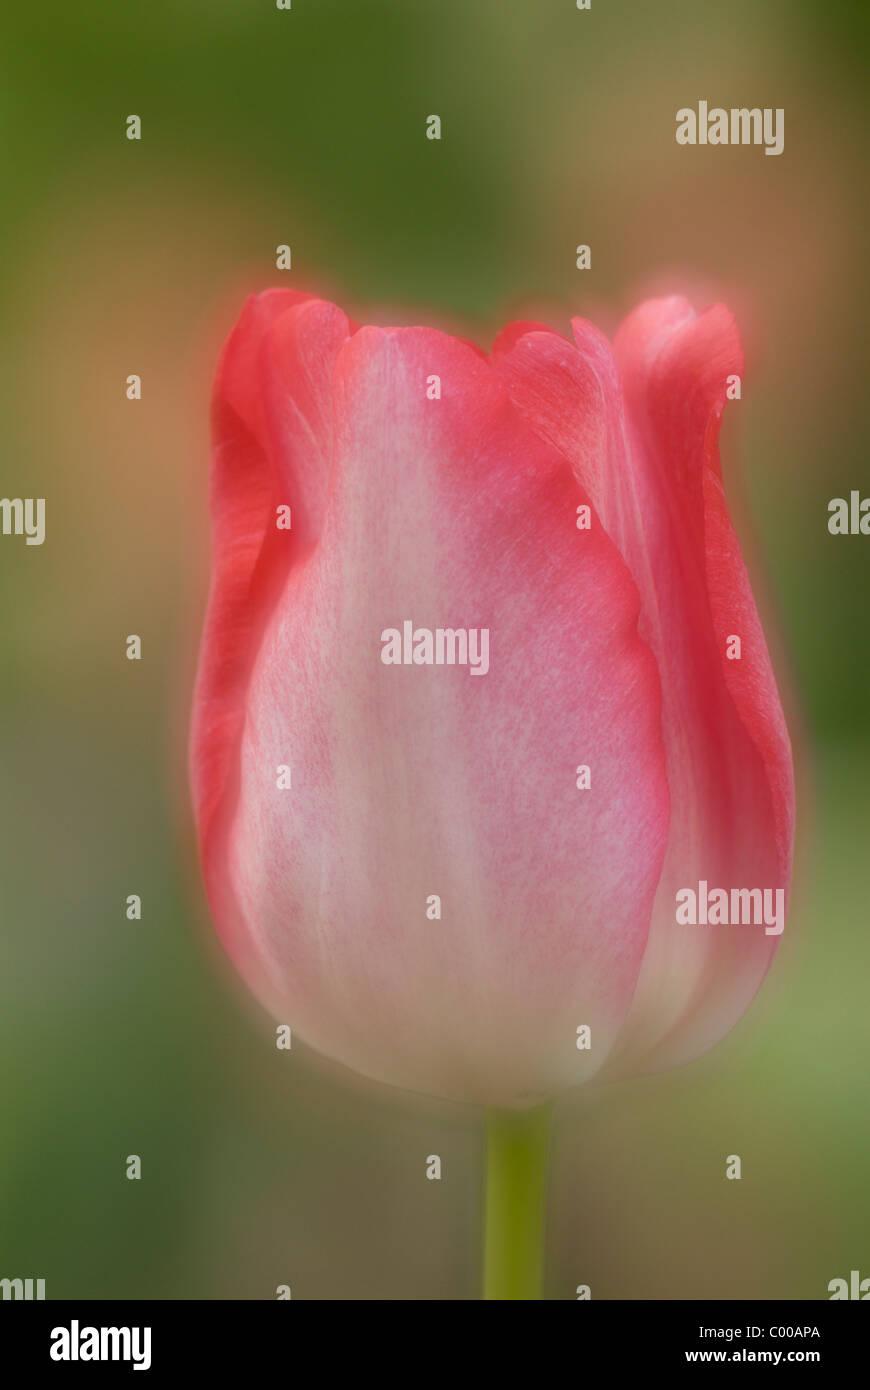 Tulpe, Tulipa spec., Tulips, Zuechtung, Strain, Variety - Stock Image